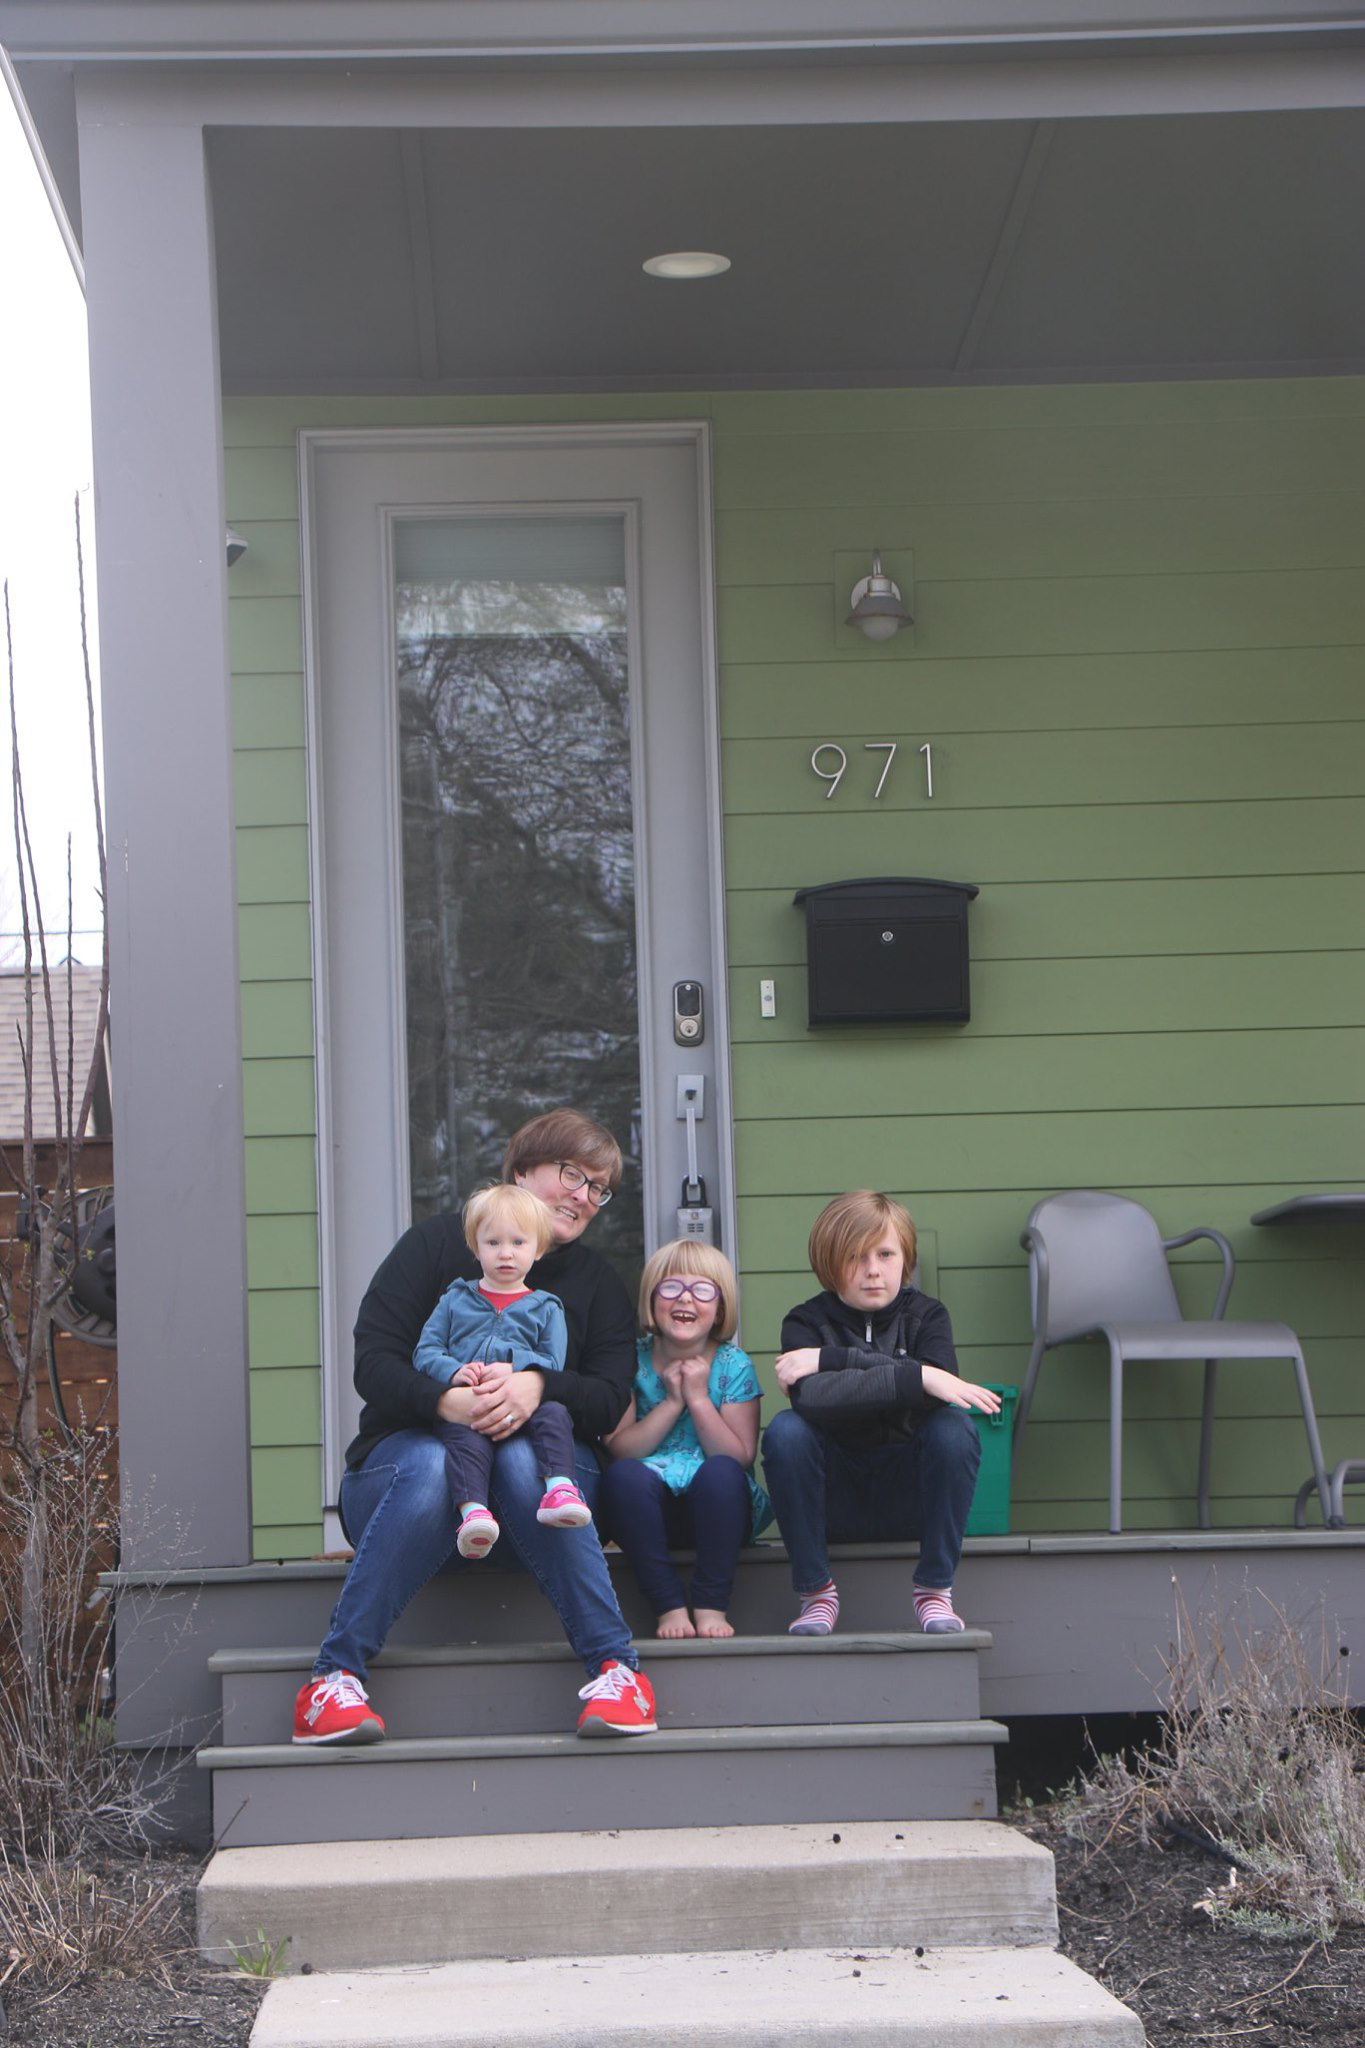 Amanda Tafflinger and family